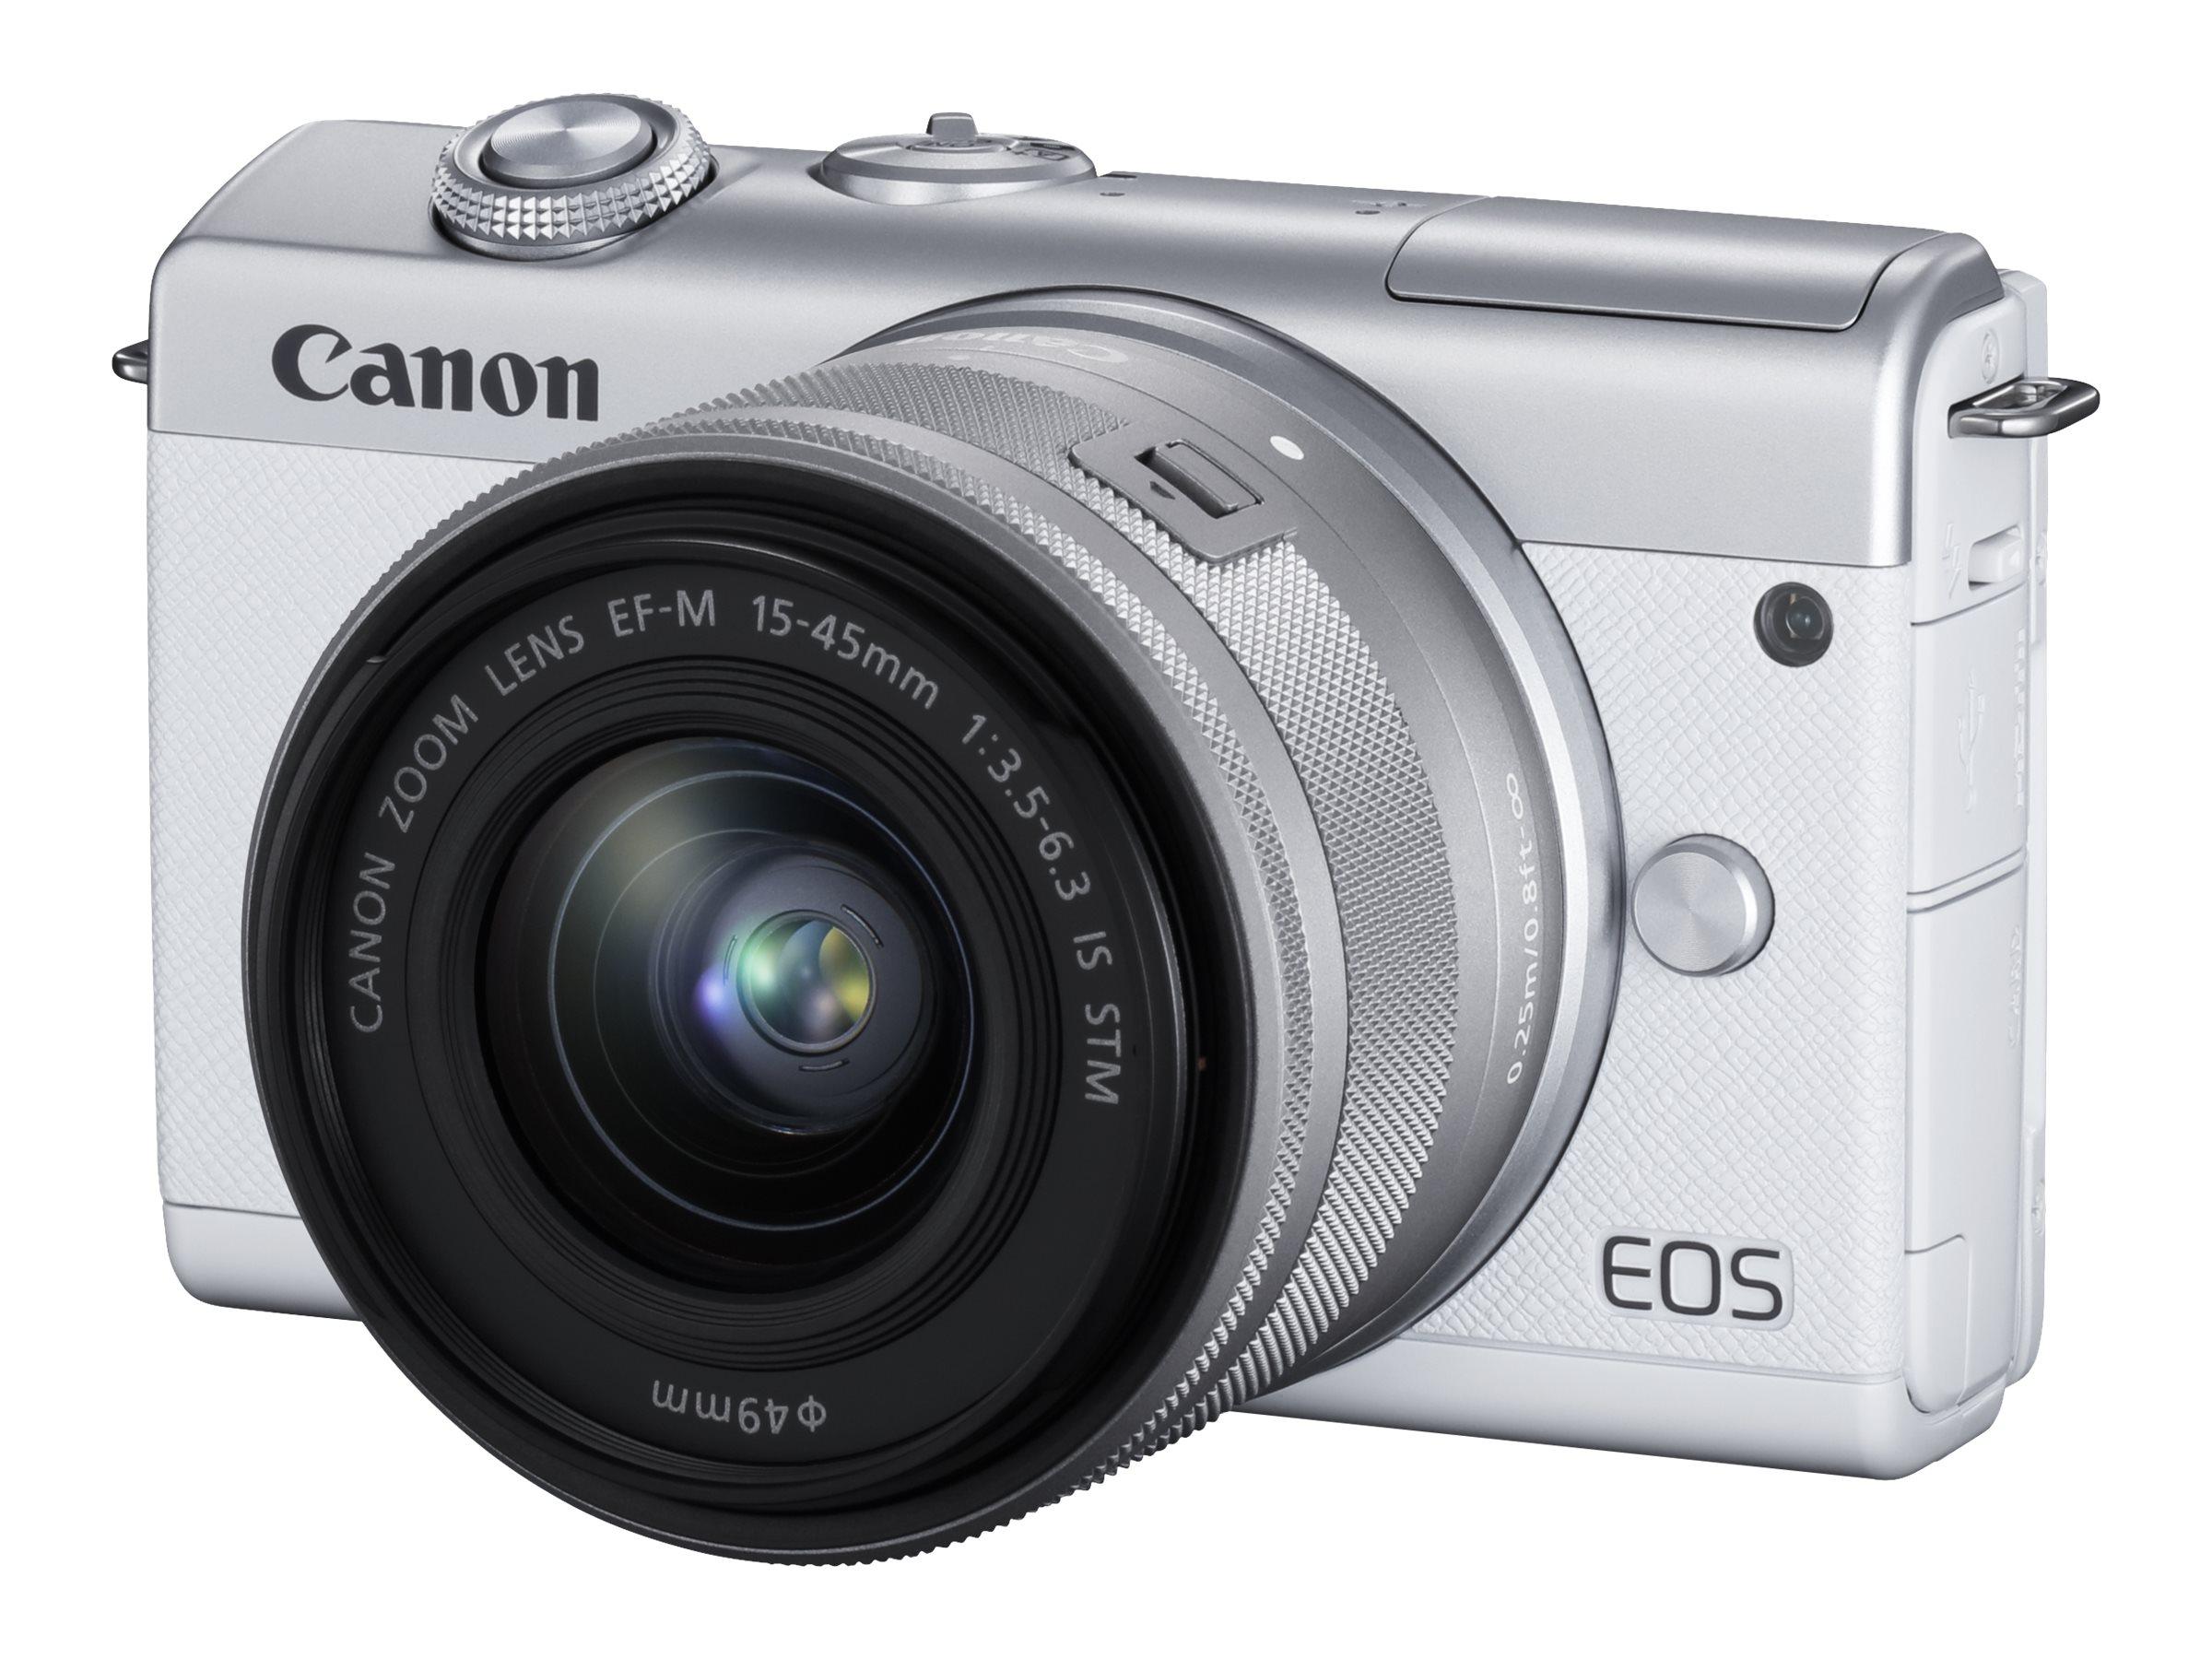 Canon EOS M200 - Digitalkamera - spiegellos - 24.1 MPix - APS-C - 4K / 25 BpS